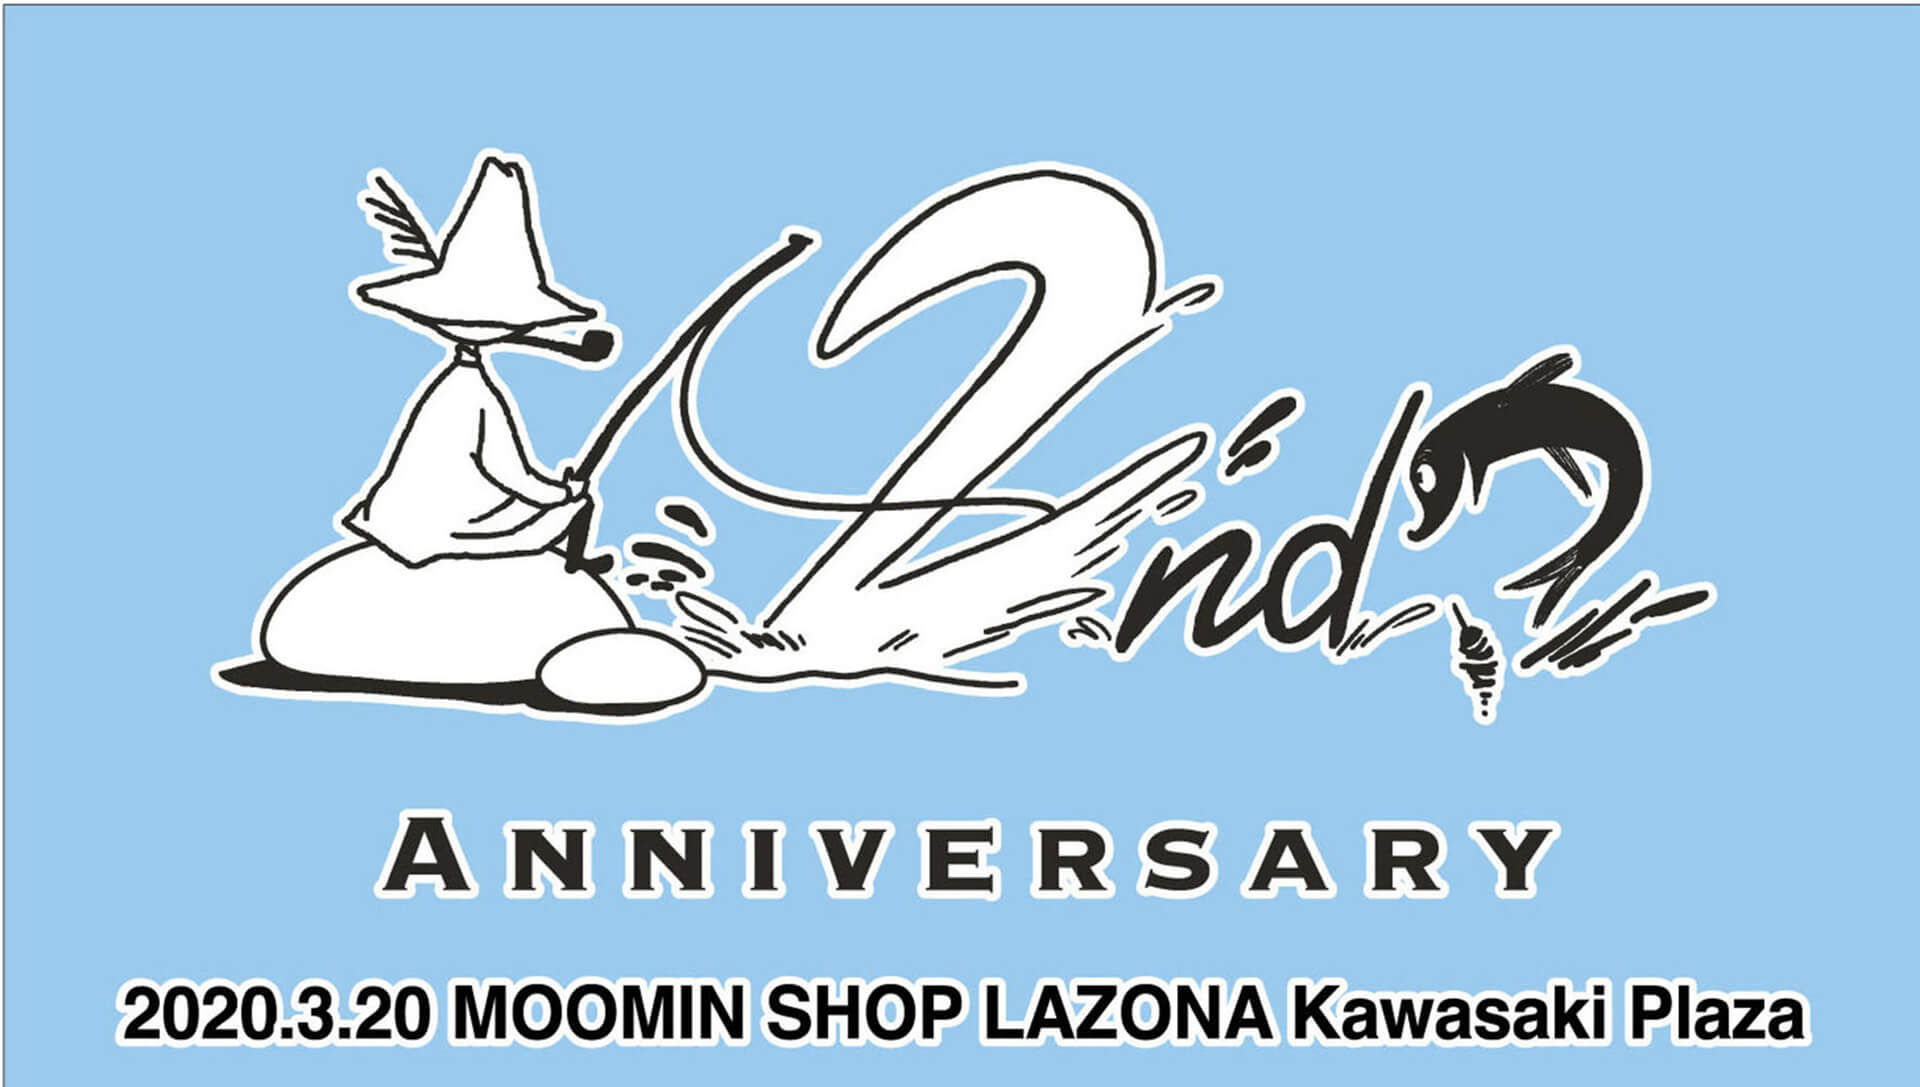 MOOMIN SHOPラゾーナ川崎プラザ店・アニバーサリーフェア